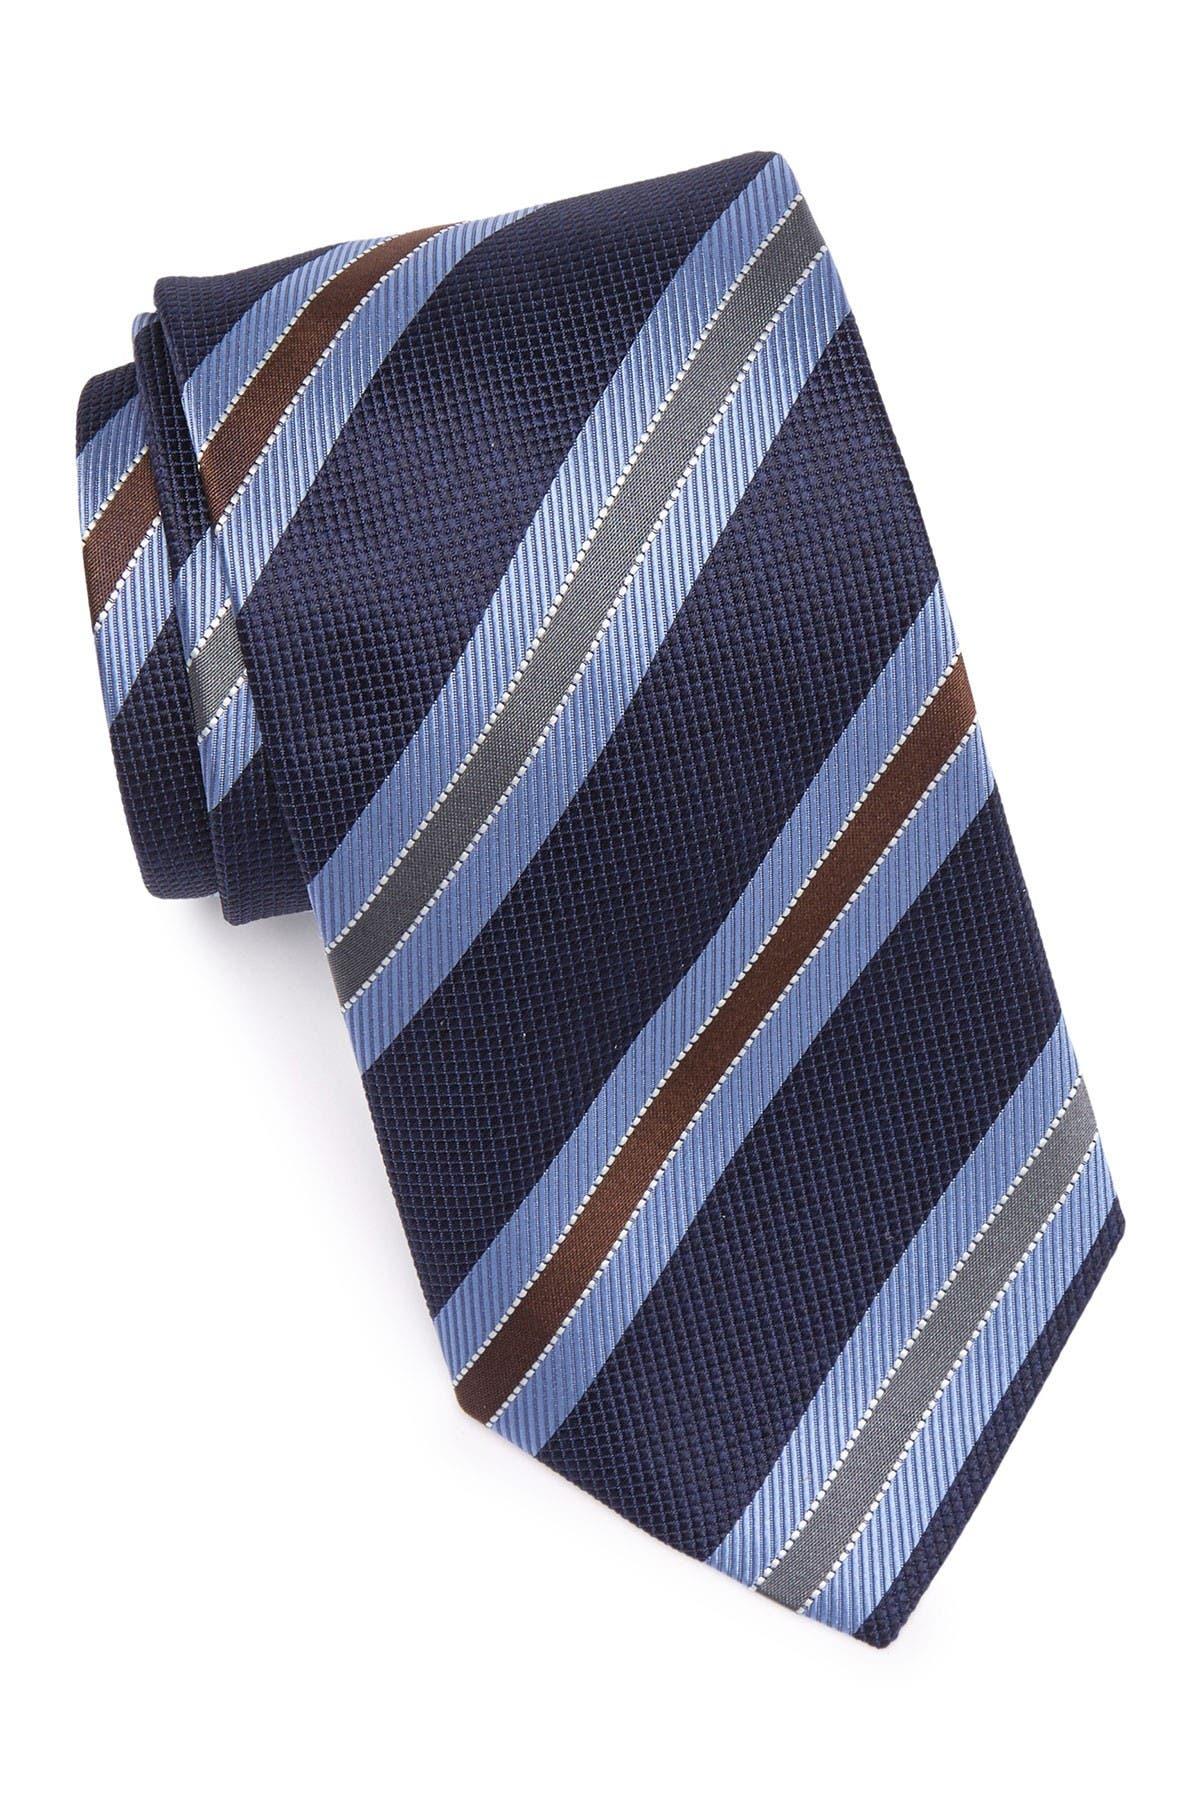 Image of Eton Stripe Print Silk Tie